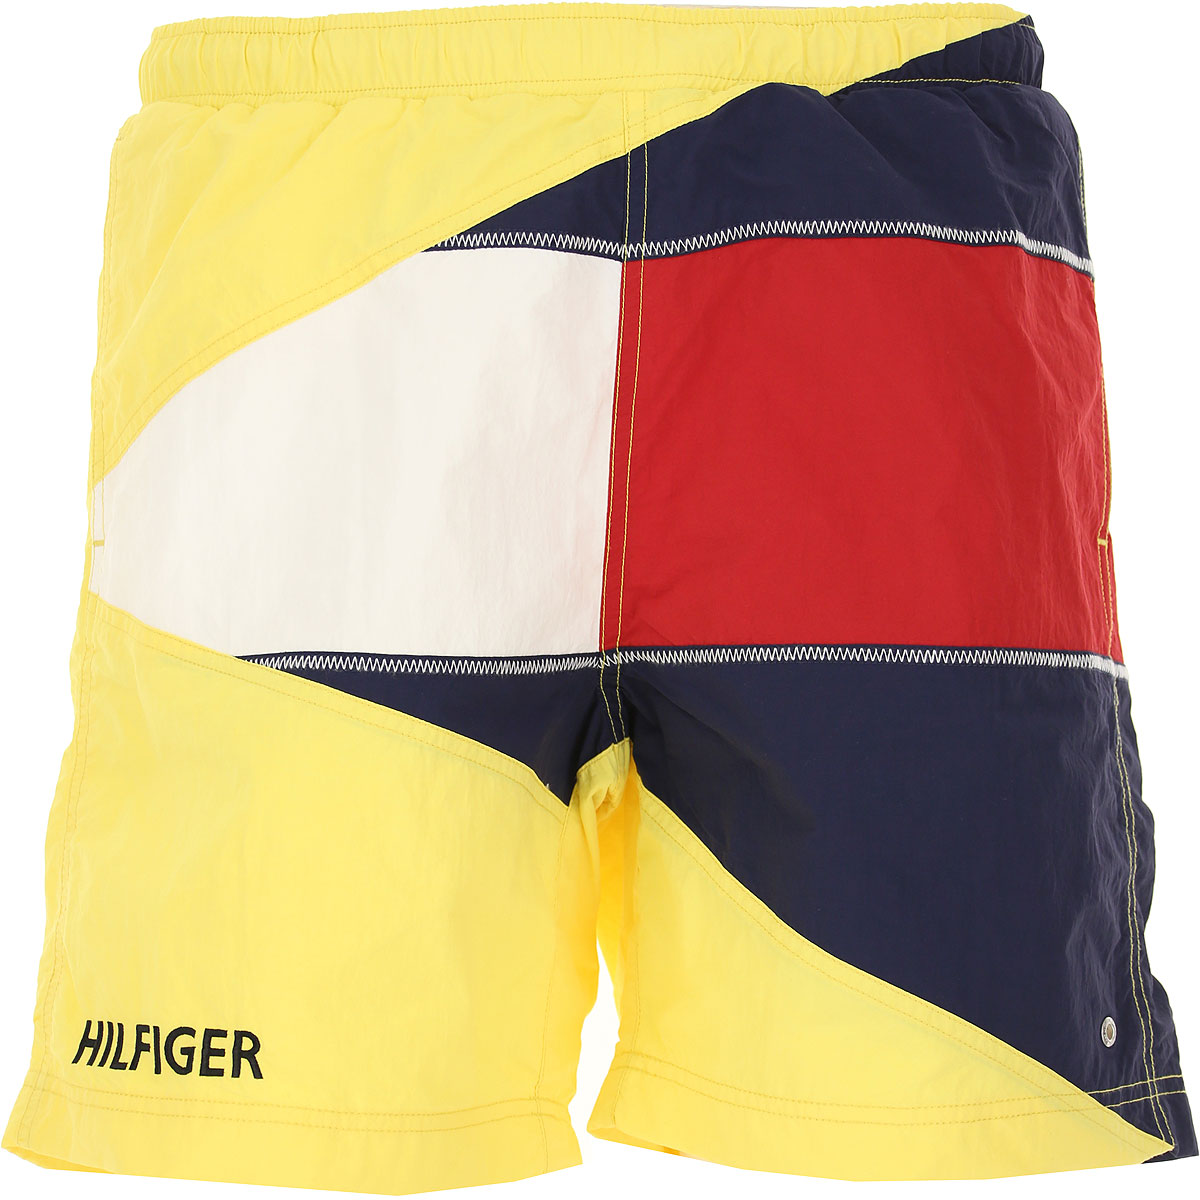 Tommy Hilfiger Mens Clothing, Yellow, polyamide, 2019, M S XS